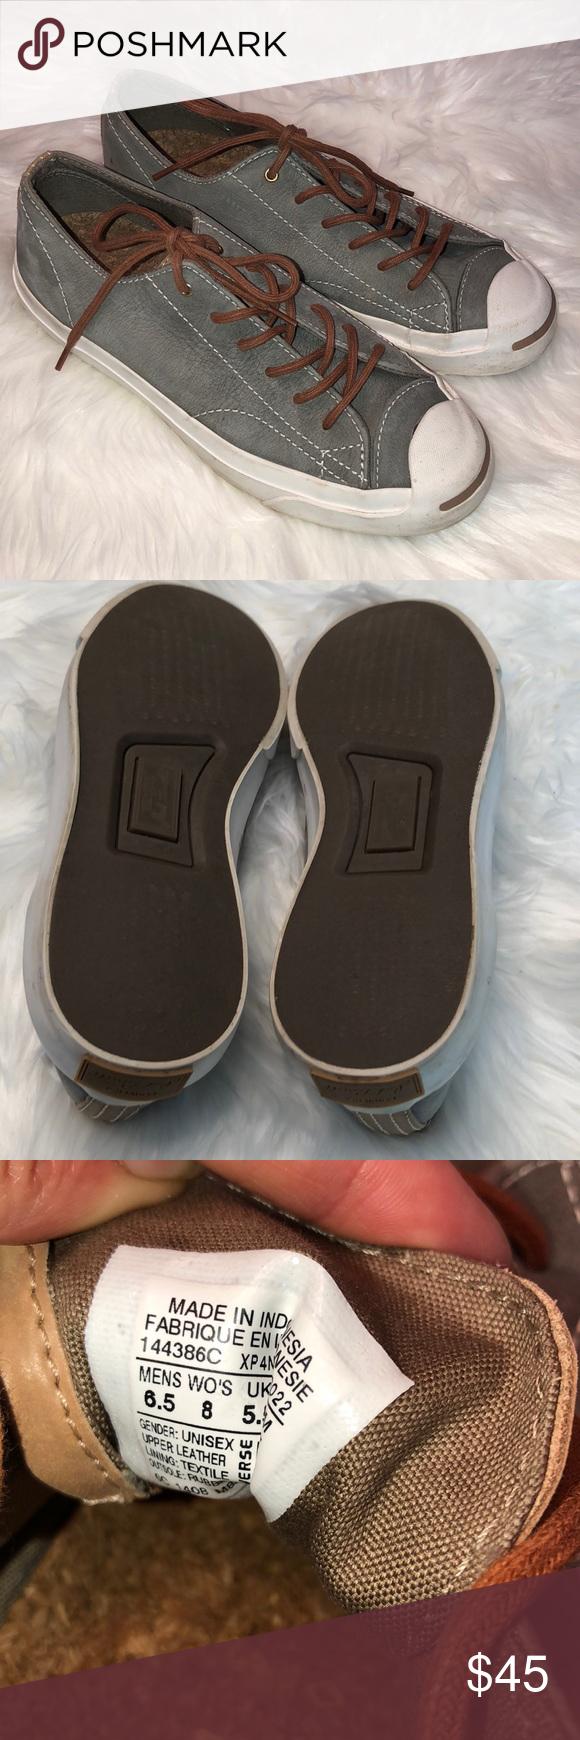 c767e55712c37c Converse Jack Purcell leather shoes EUC Unisex Men s 6.5 Women s 8 Grey  leather! Limited edition Converse Shoes Sneakers